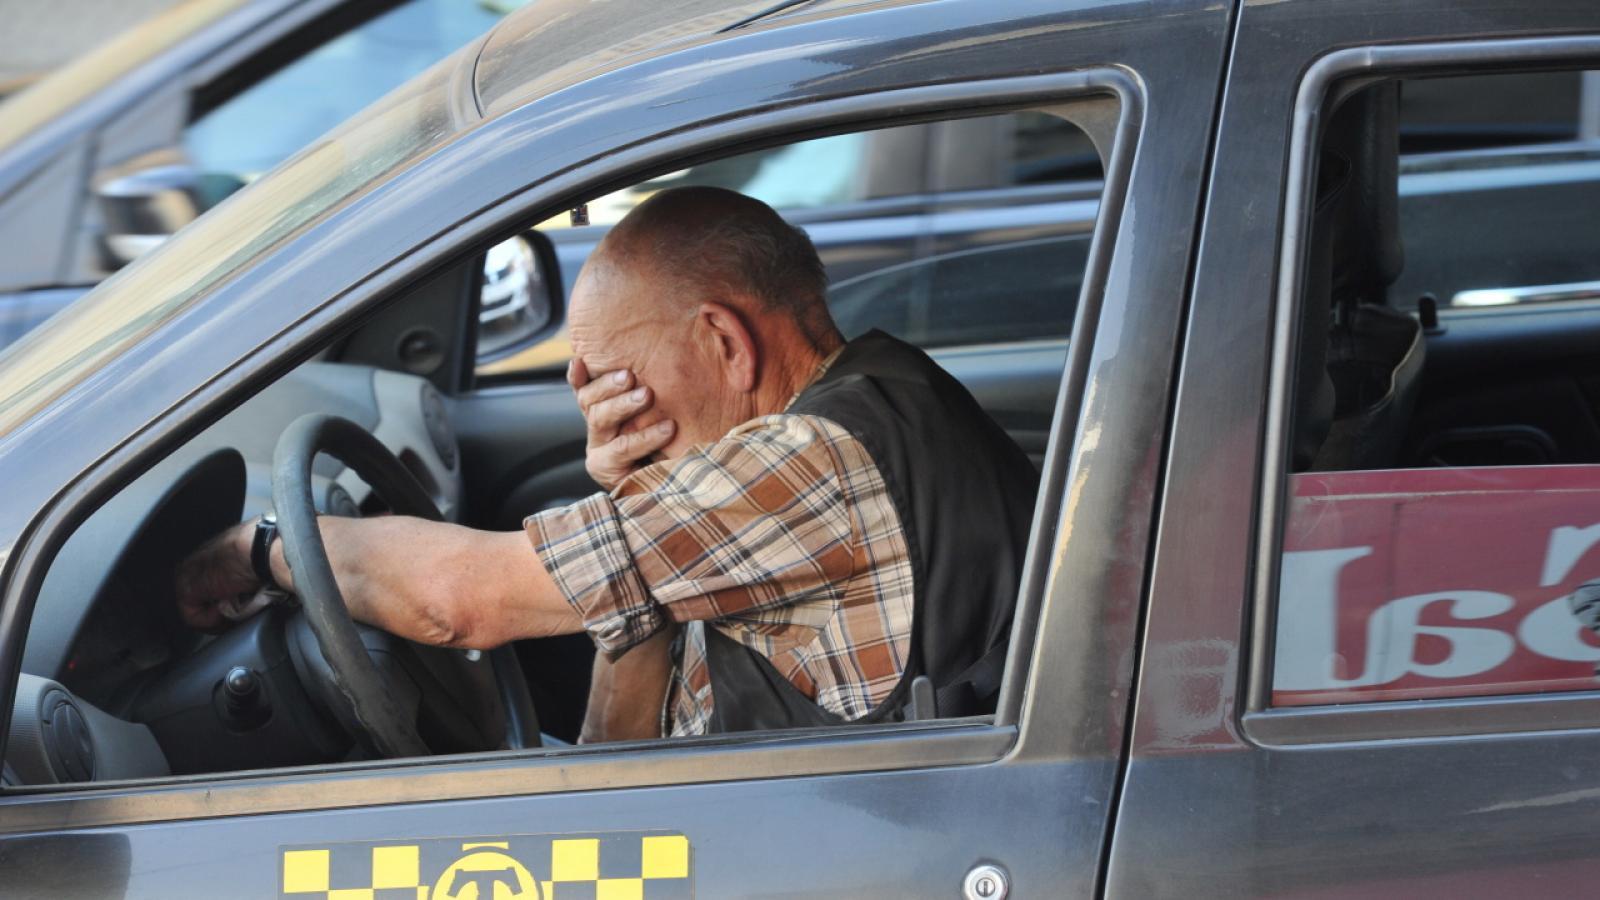 Череповчанин избил таксиста, не оплатив поездку